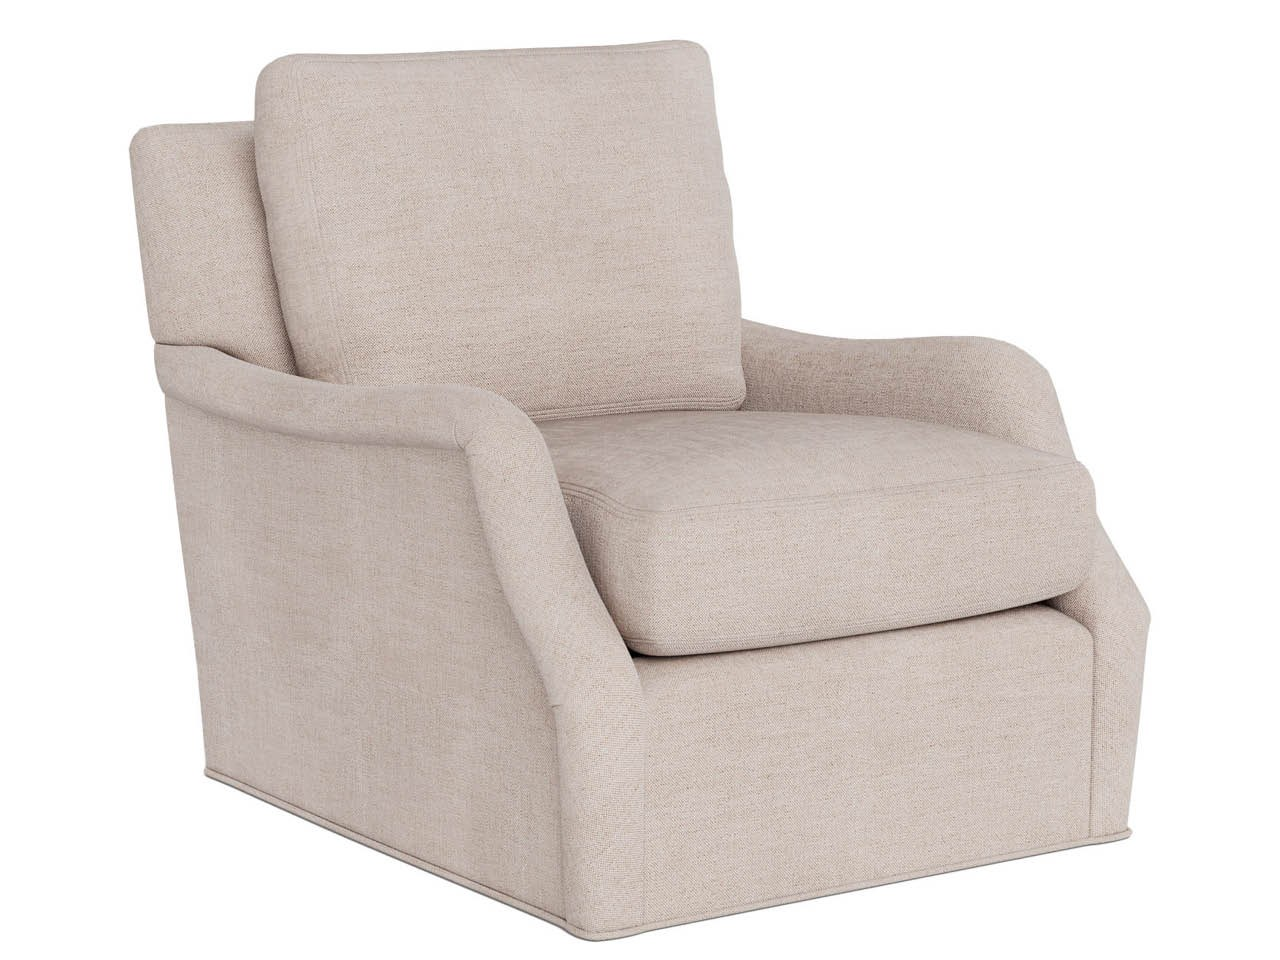 Atlas Swivel Chair - Special Order